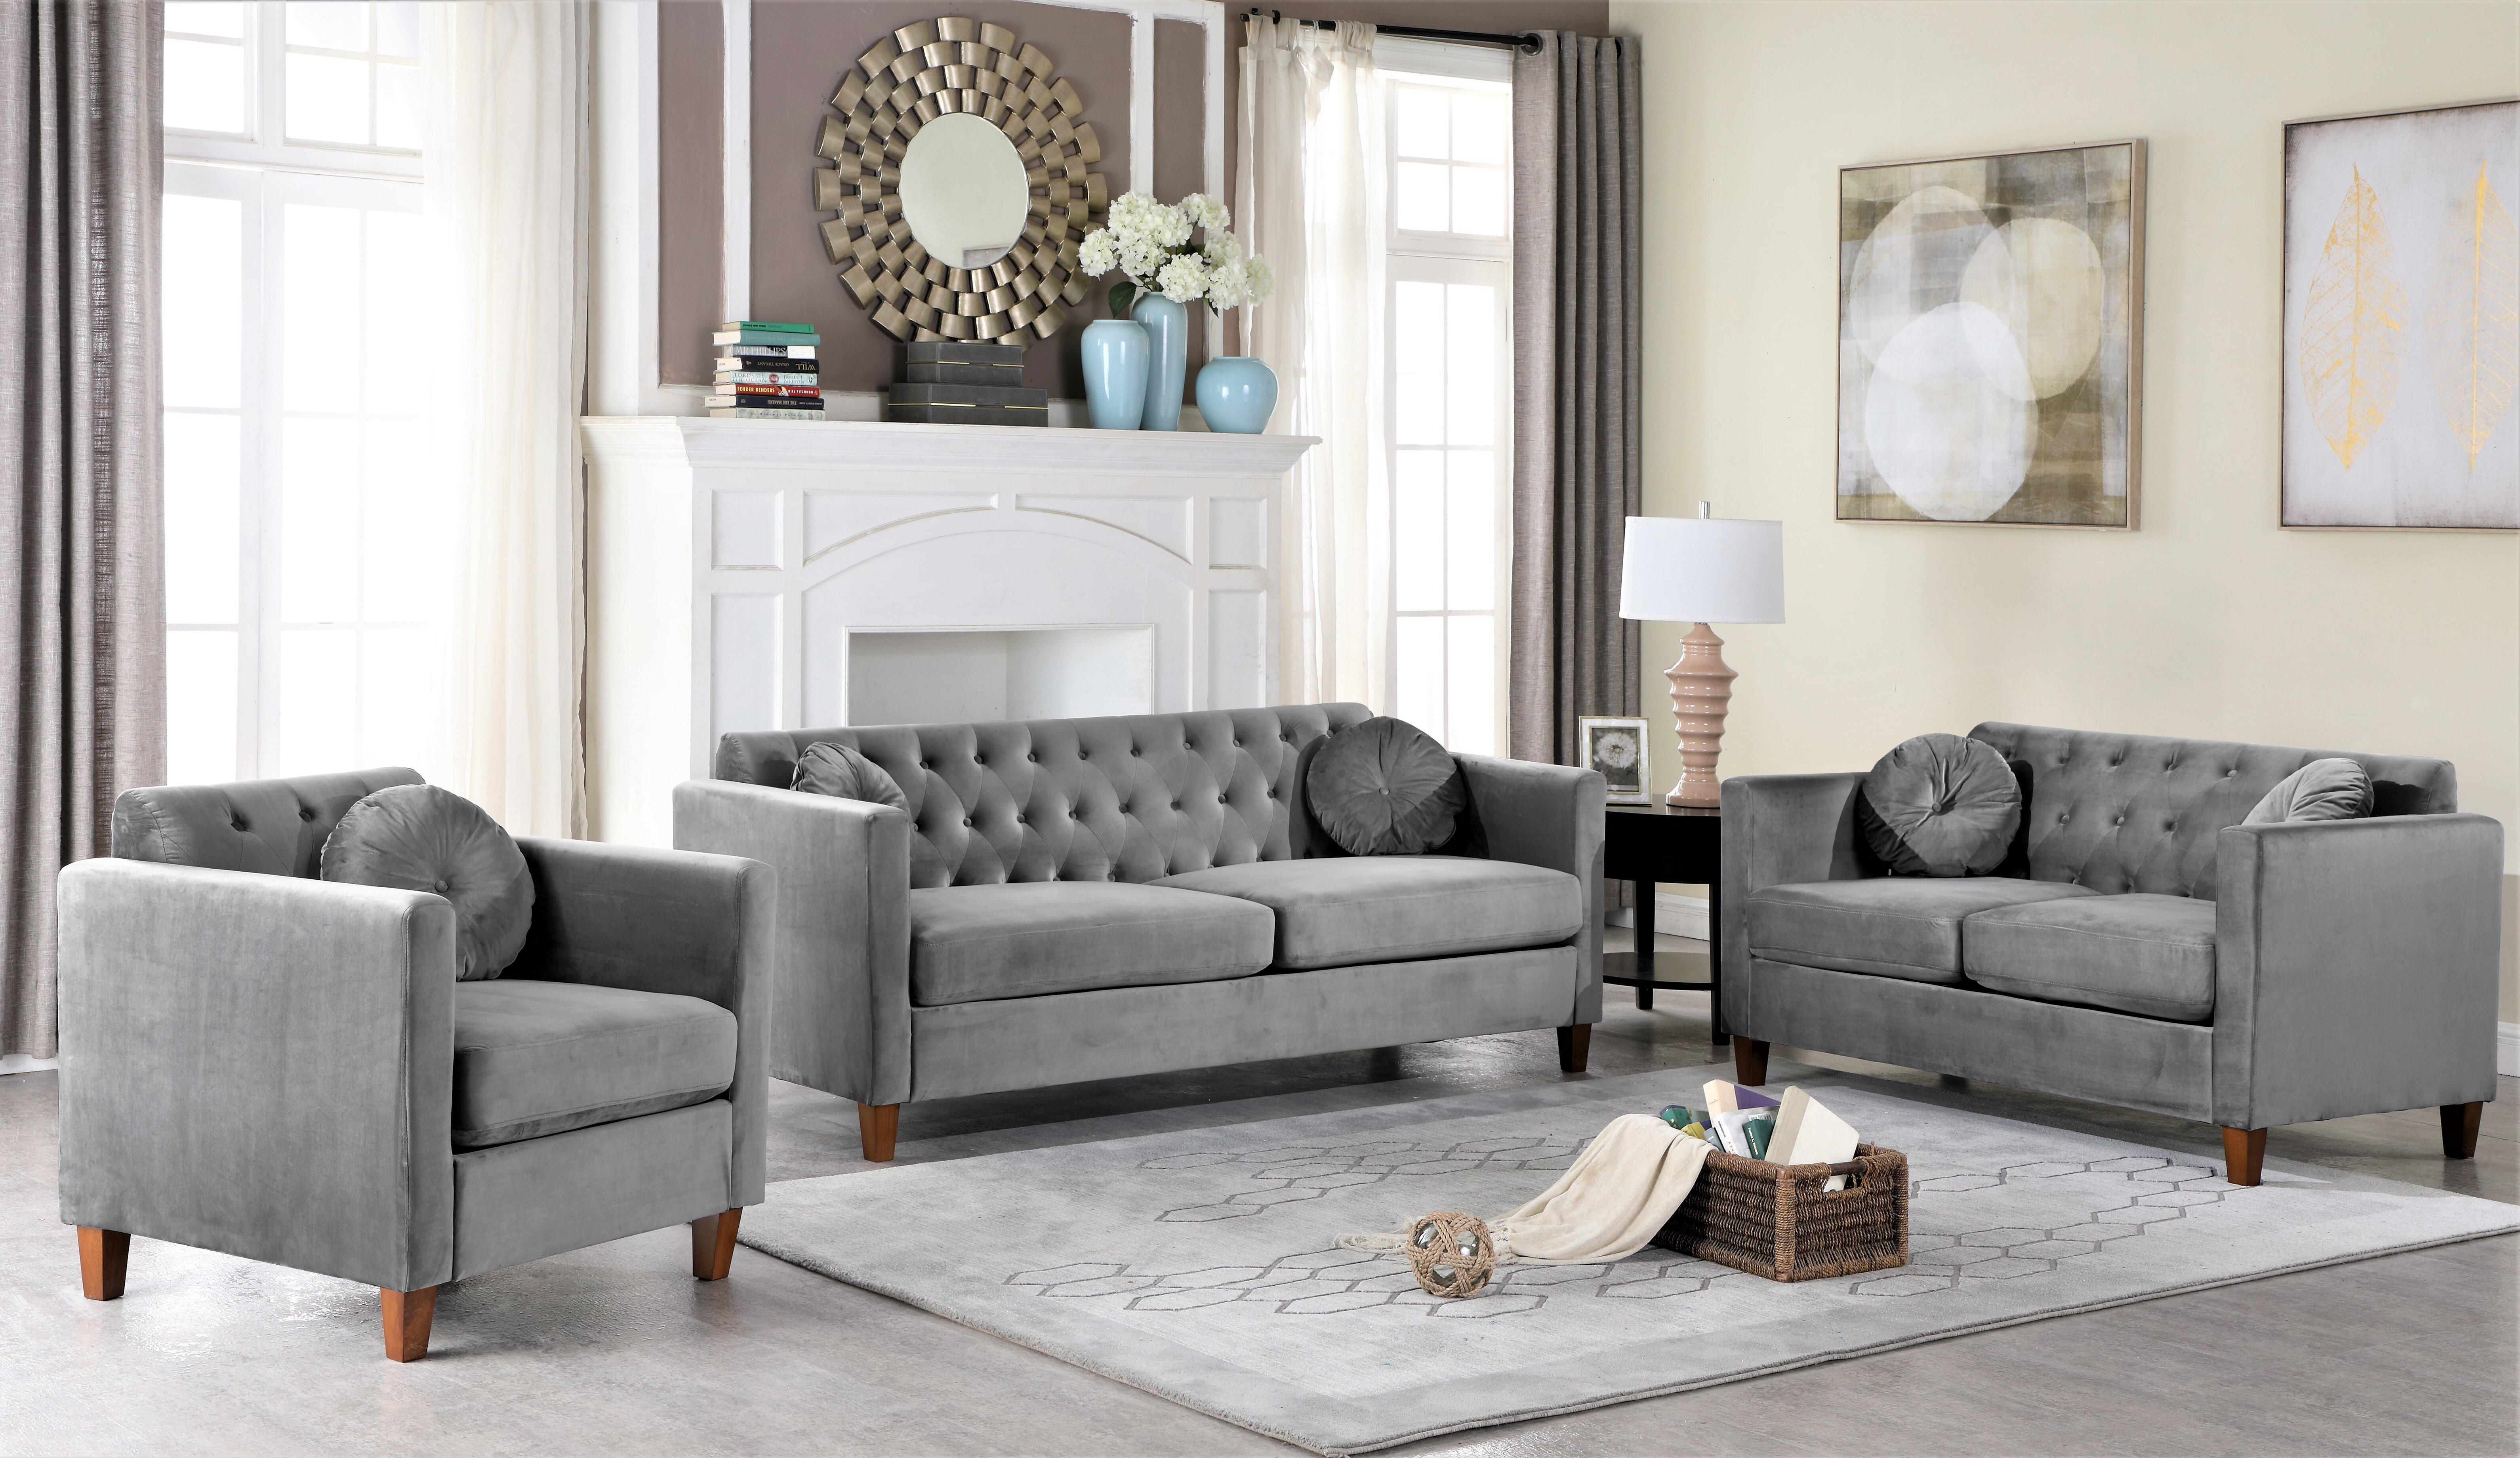 Persaud Velvet Classic Chesterfield 3 Piece Living Room Set